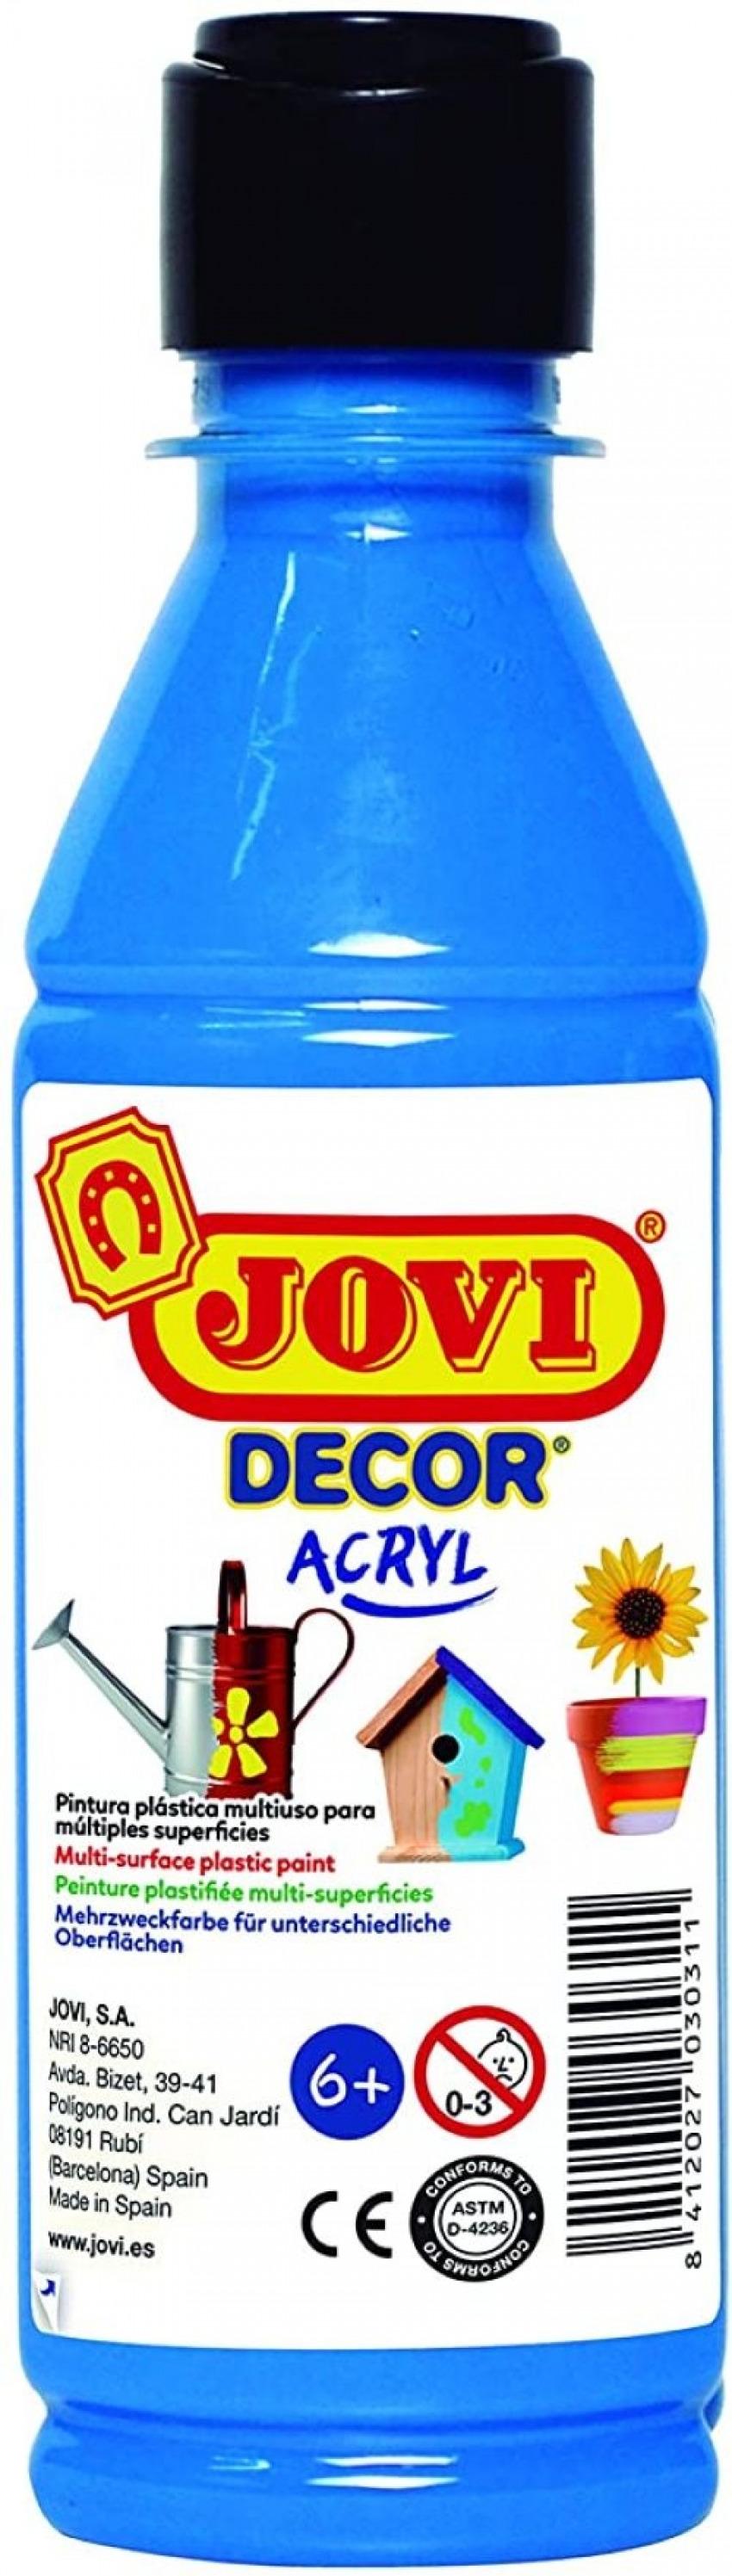 BOTE PINTURA JOVIDECOR ACRYL AZUL CYAN 250ML 8412027024457